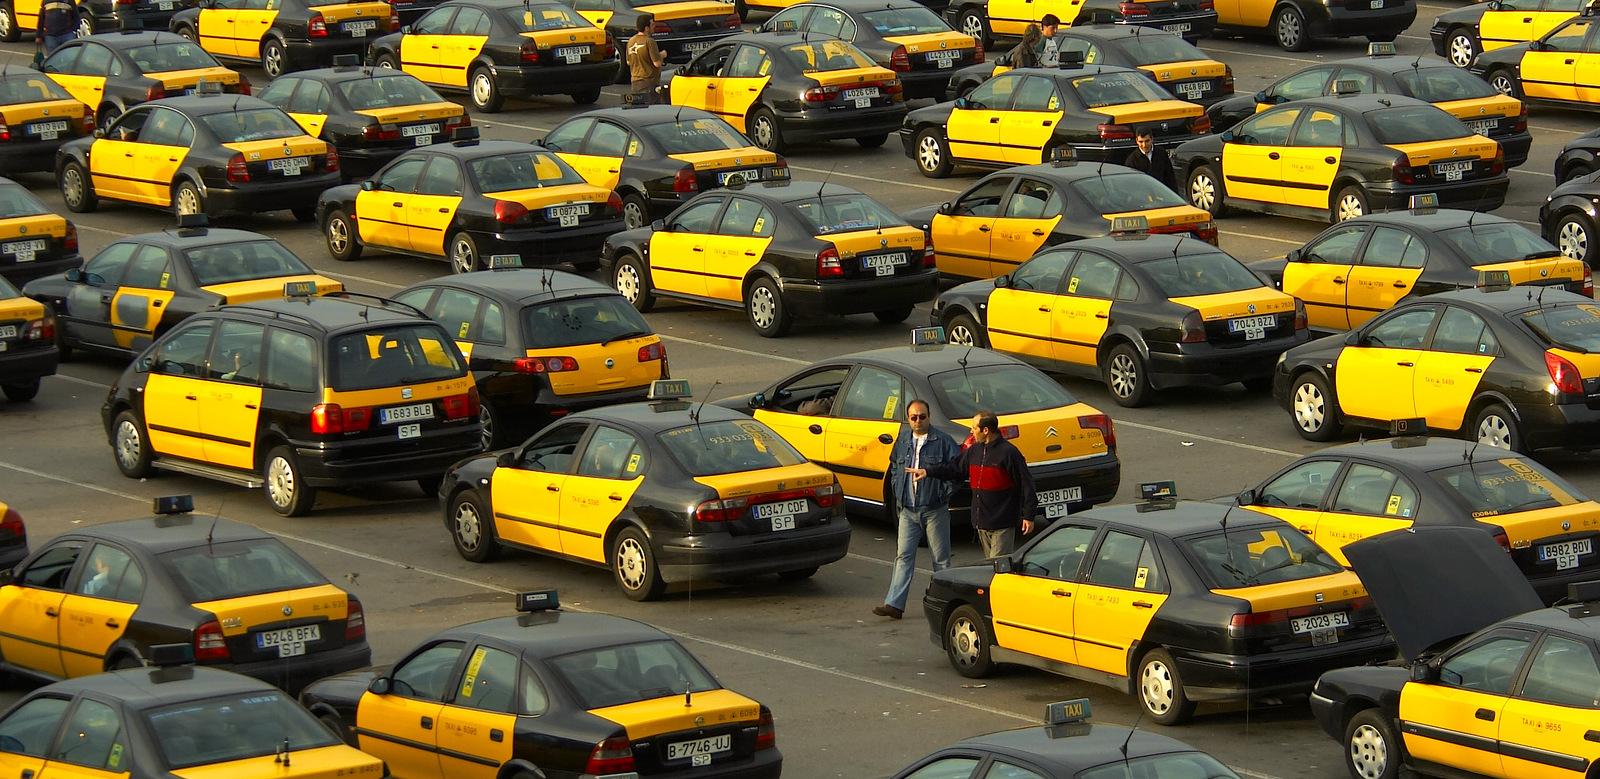 Авто-факт: в Барселоне рекордное количество таксистов (видео)